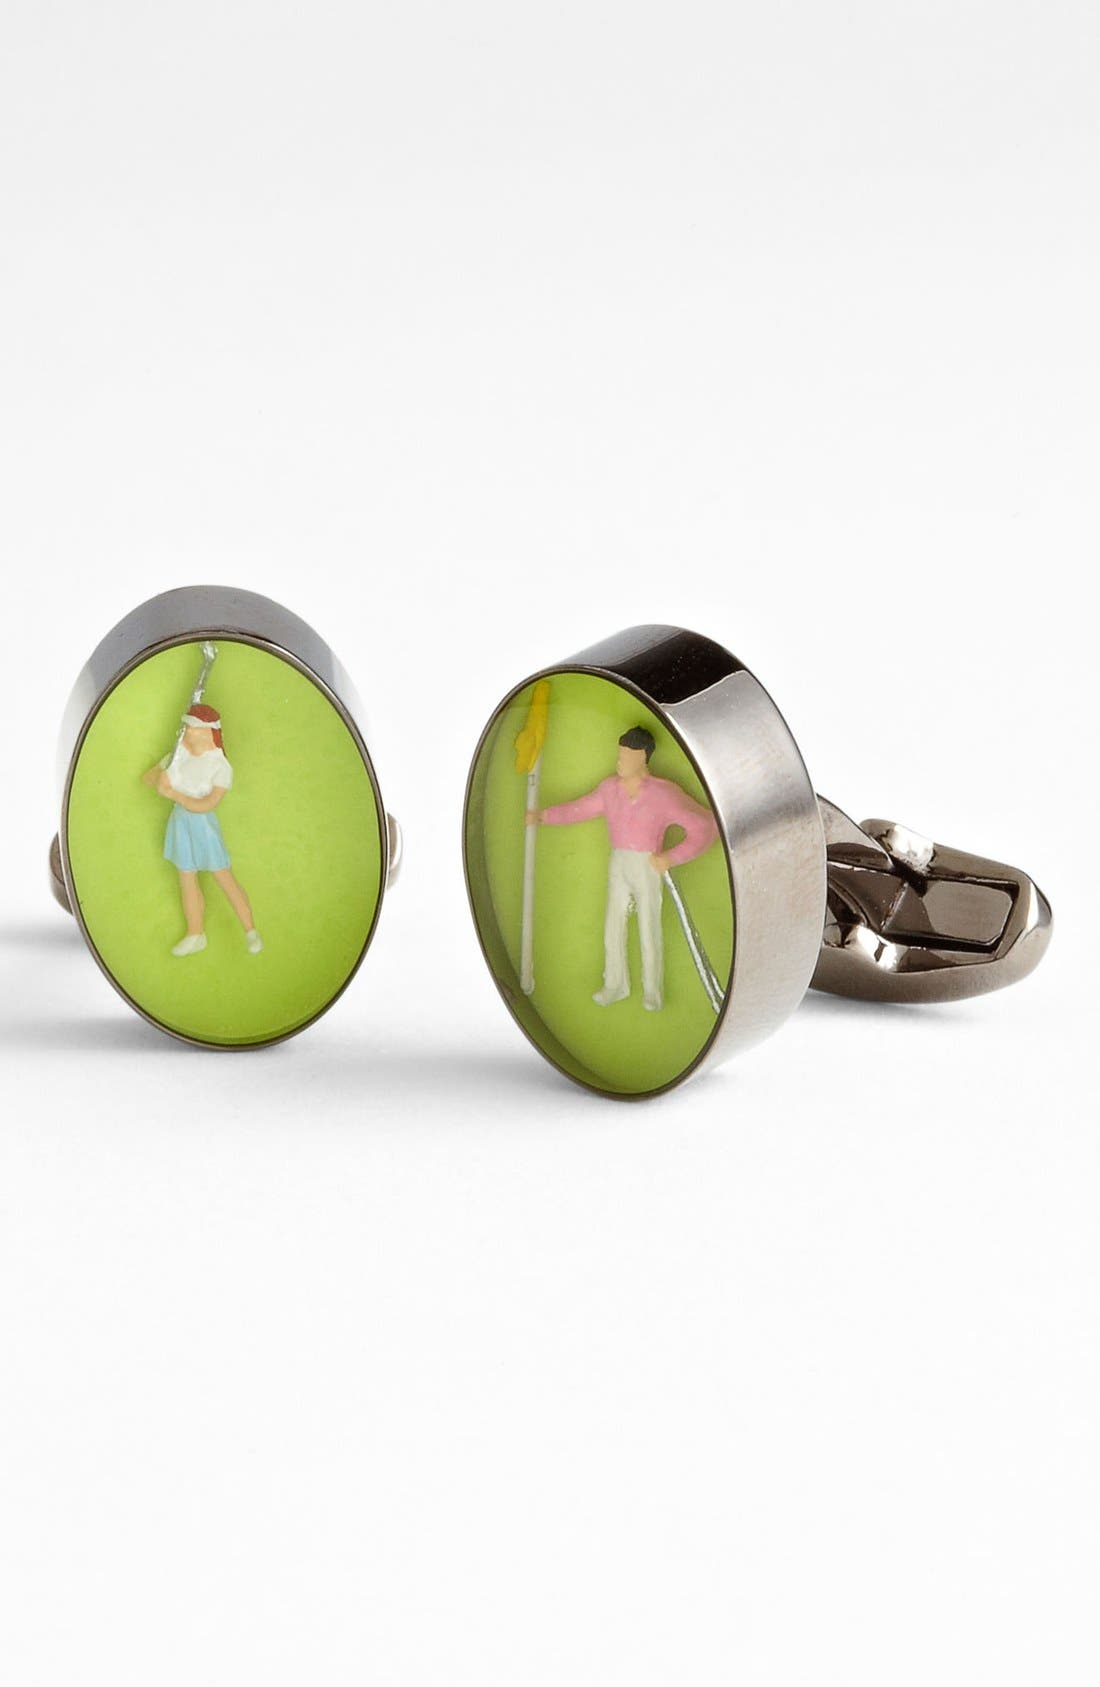 Main Image - Paul Smith Accessories 'Golfing Figure' Cuff Links